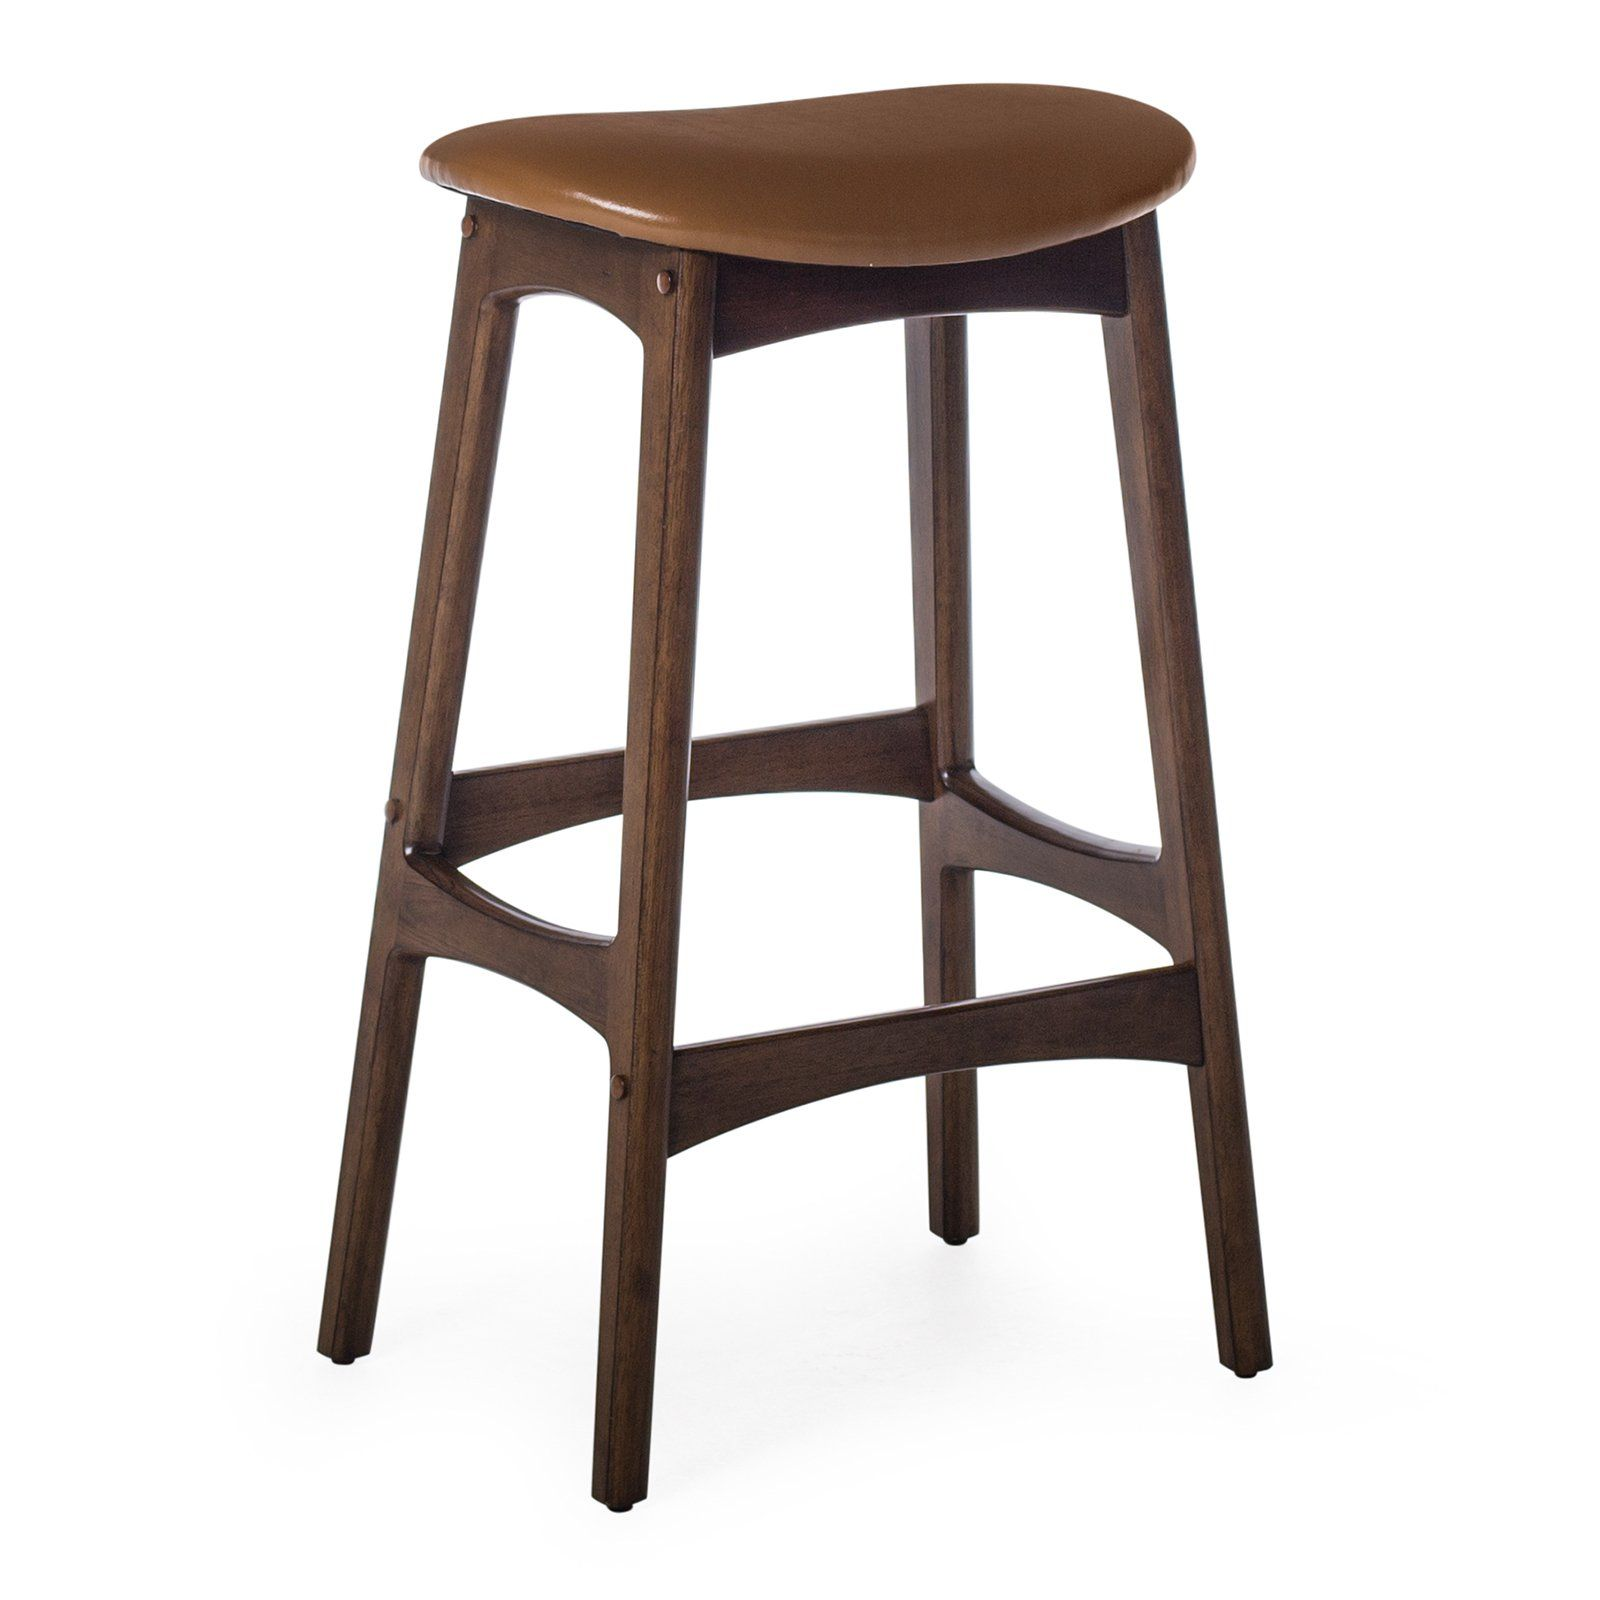 Belham Living Carter Mid Century Modern Backless Bar Stool Counter Stools Backless Backless Bar Stools Mid Century Bar Stools